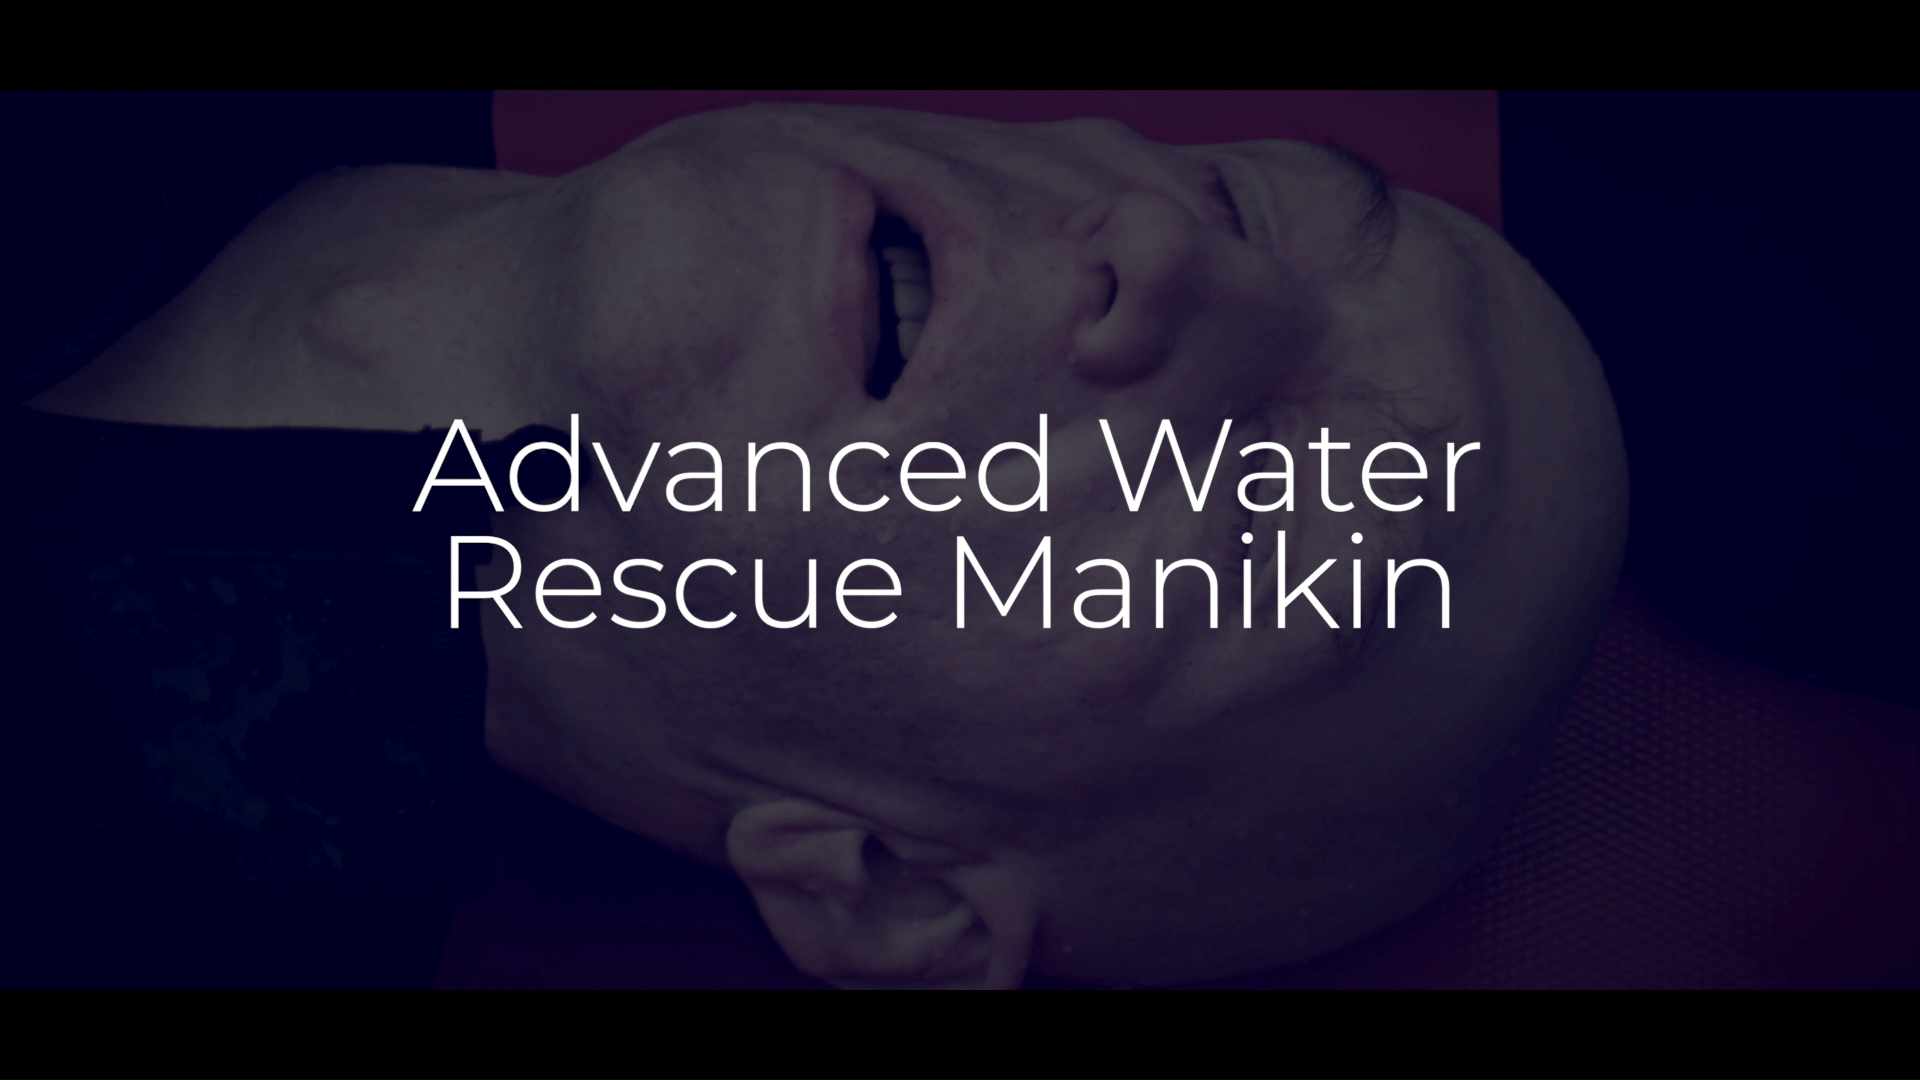 Advanced Water Rescue Manikin